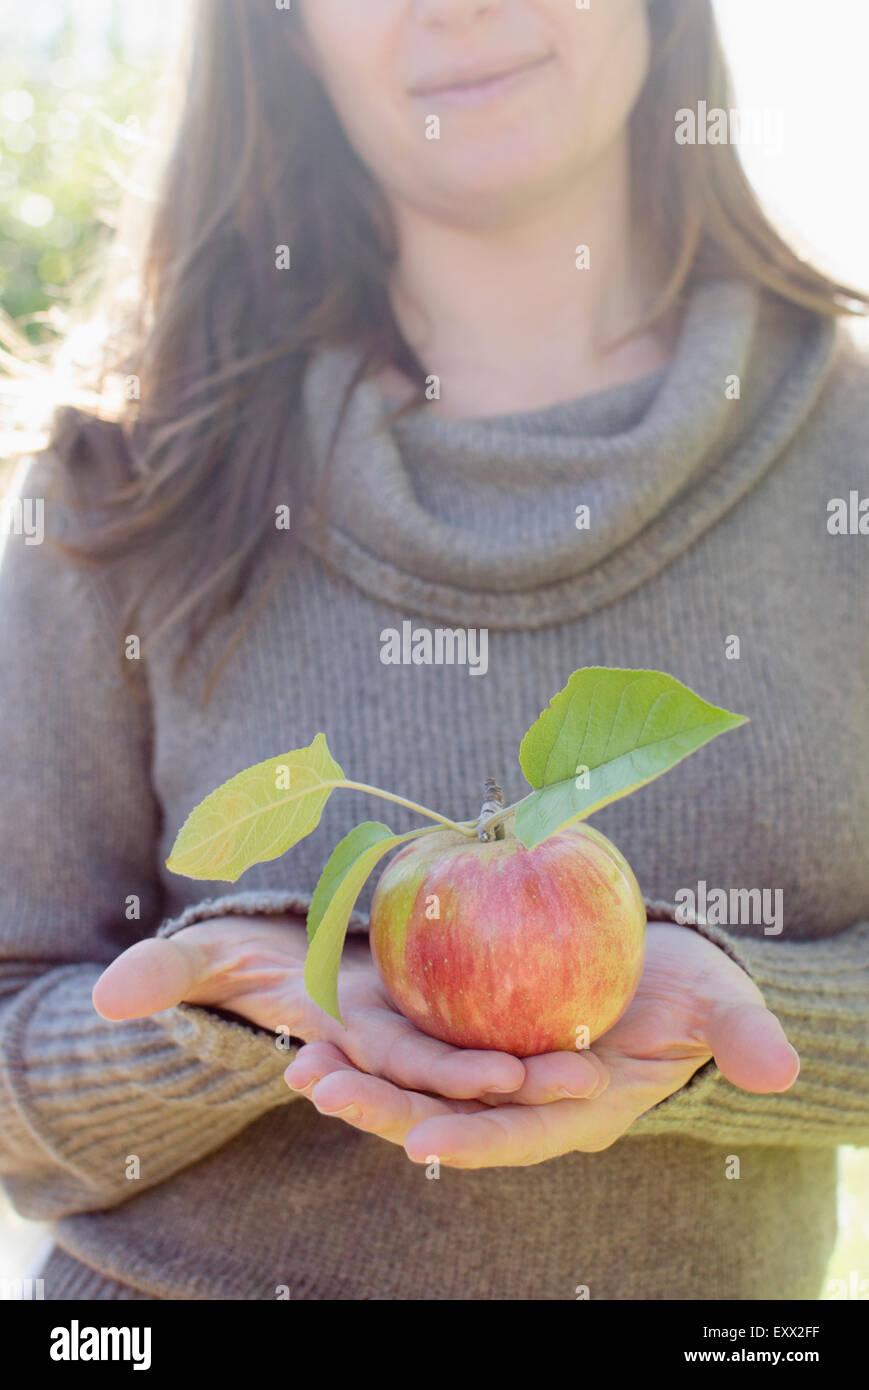 Femme hand holding apple fraîchement cueillies Photo Stock